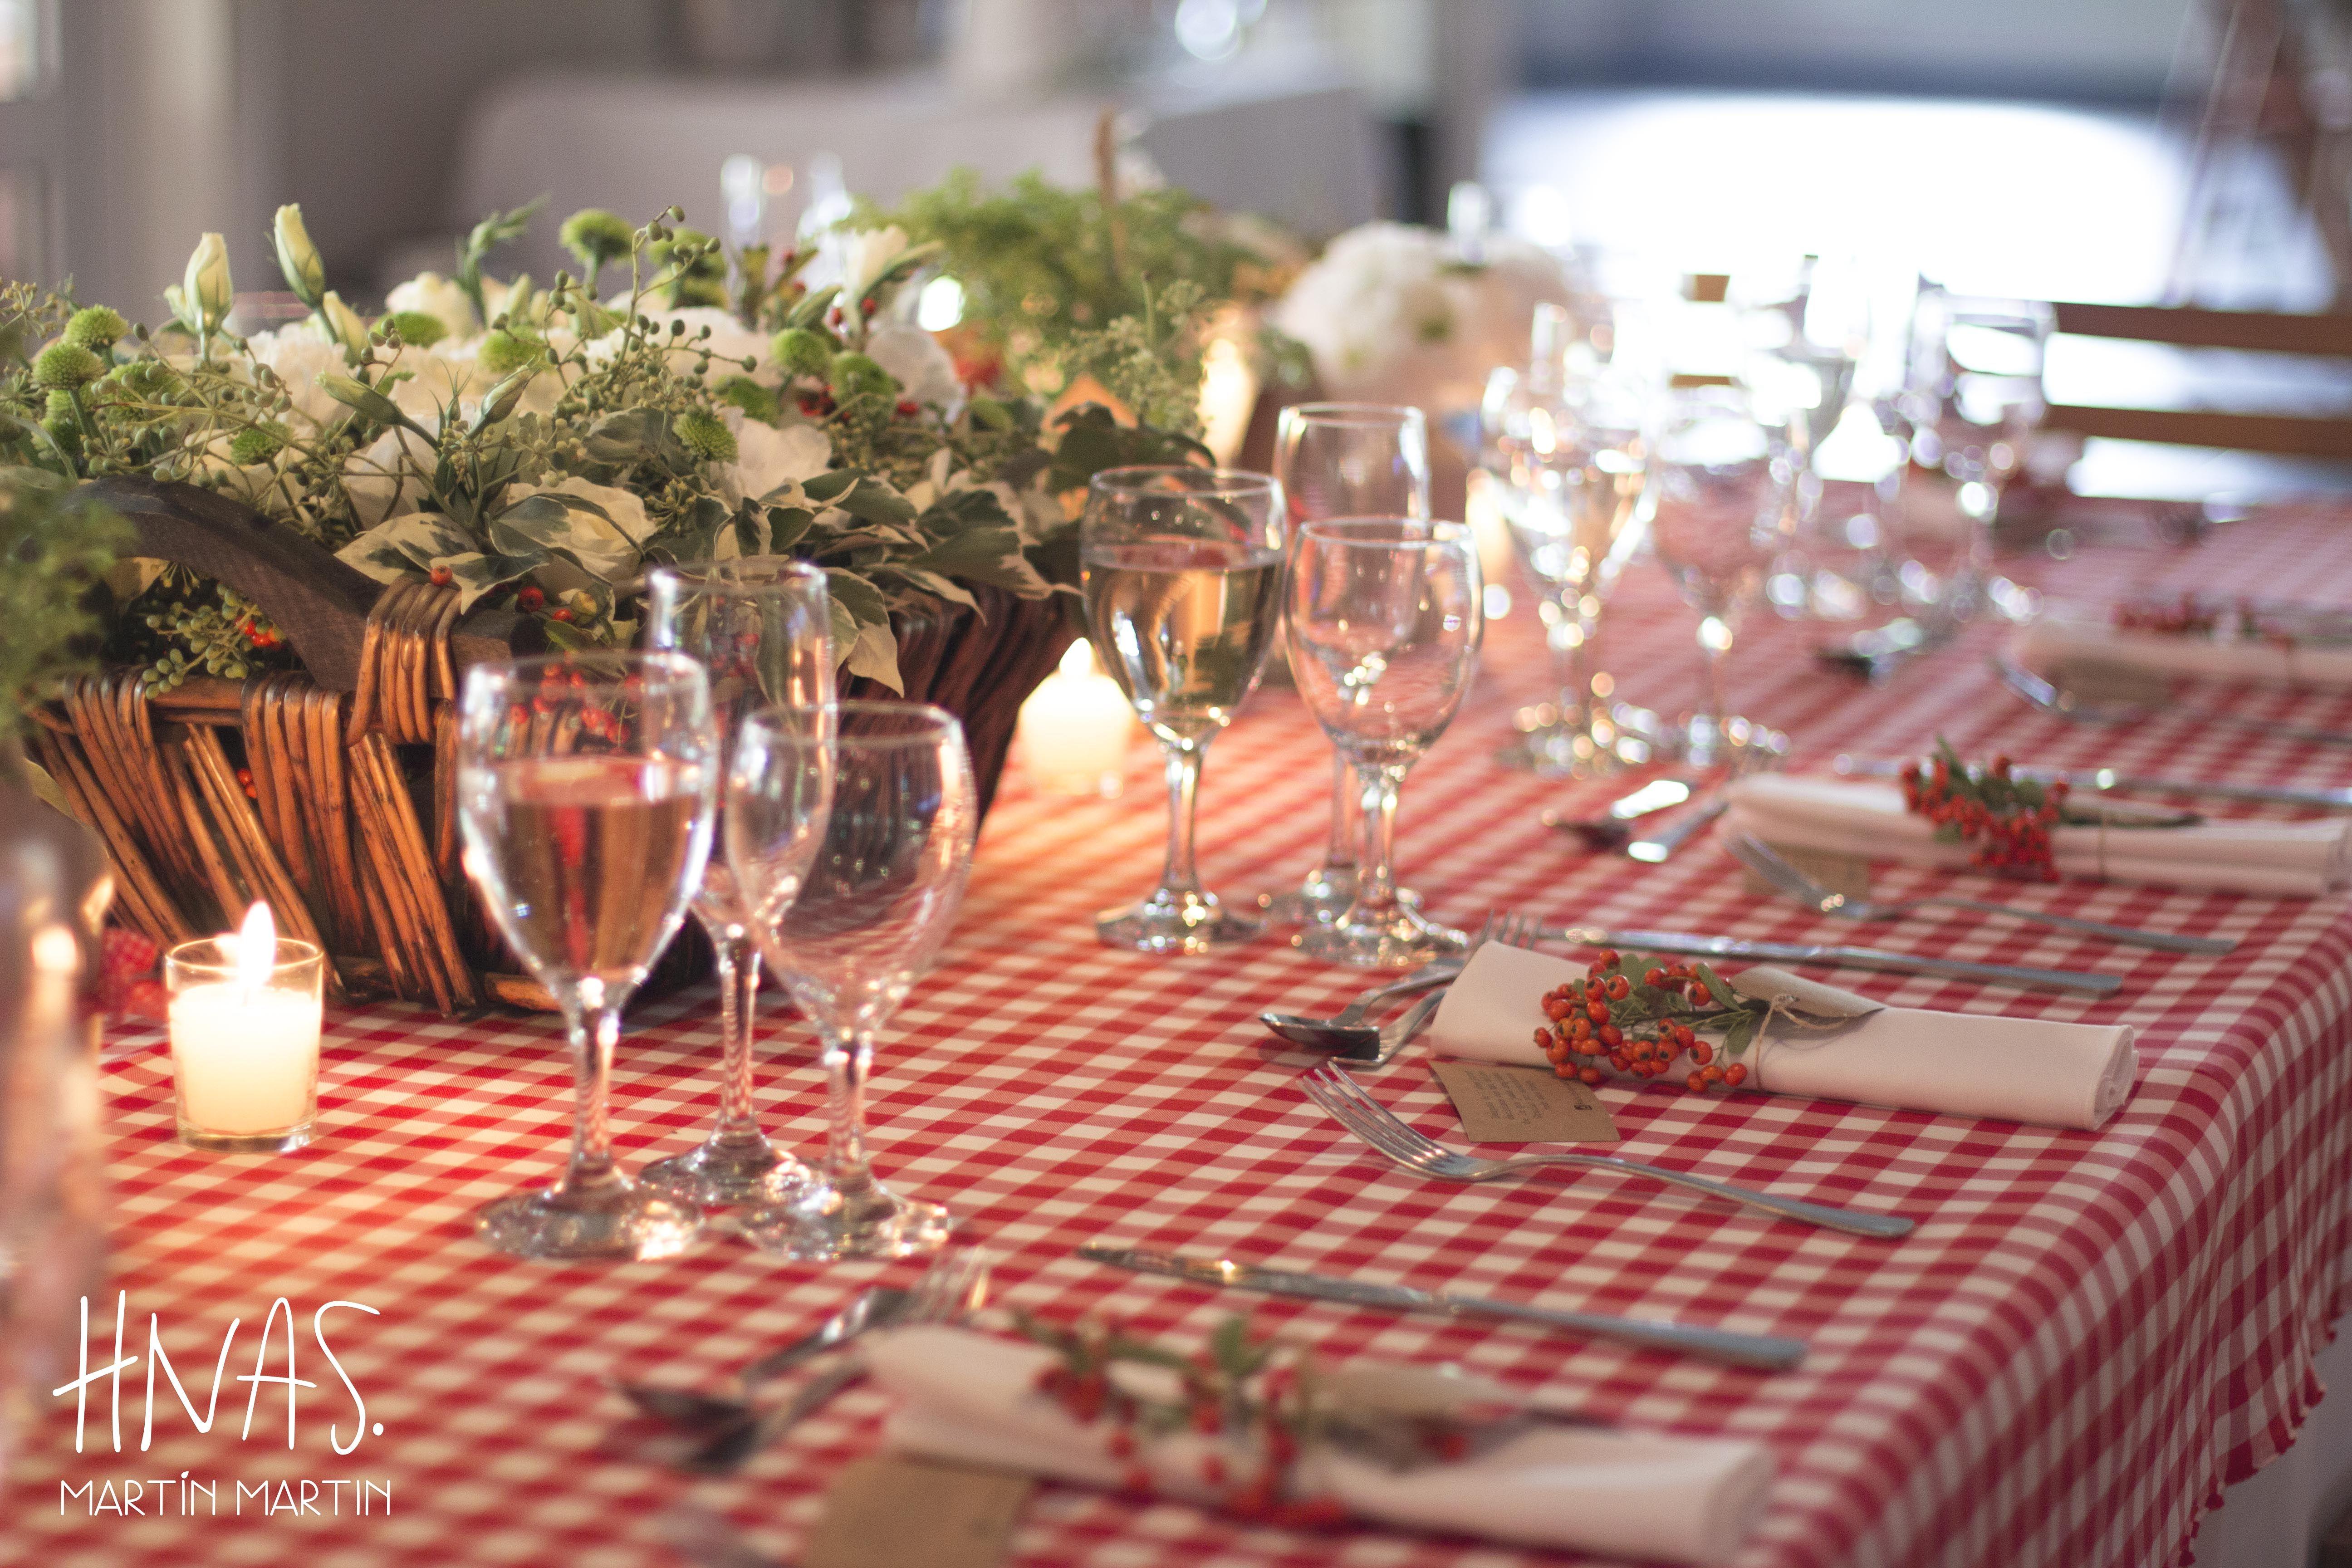 Casamiento con ambientación estilo picnic, centro de mesa decor wedding picnic style, centerpiece